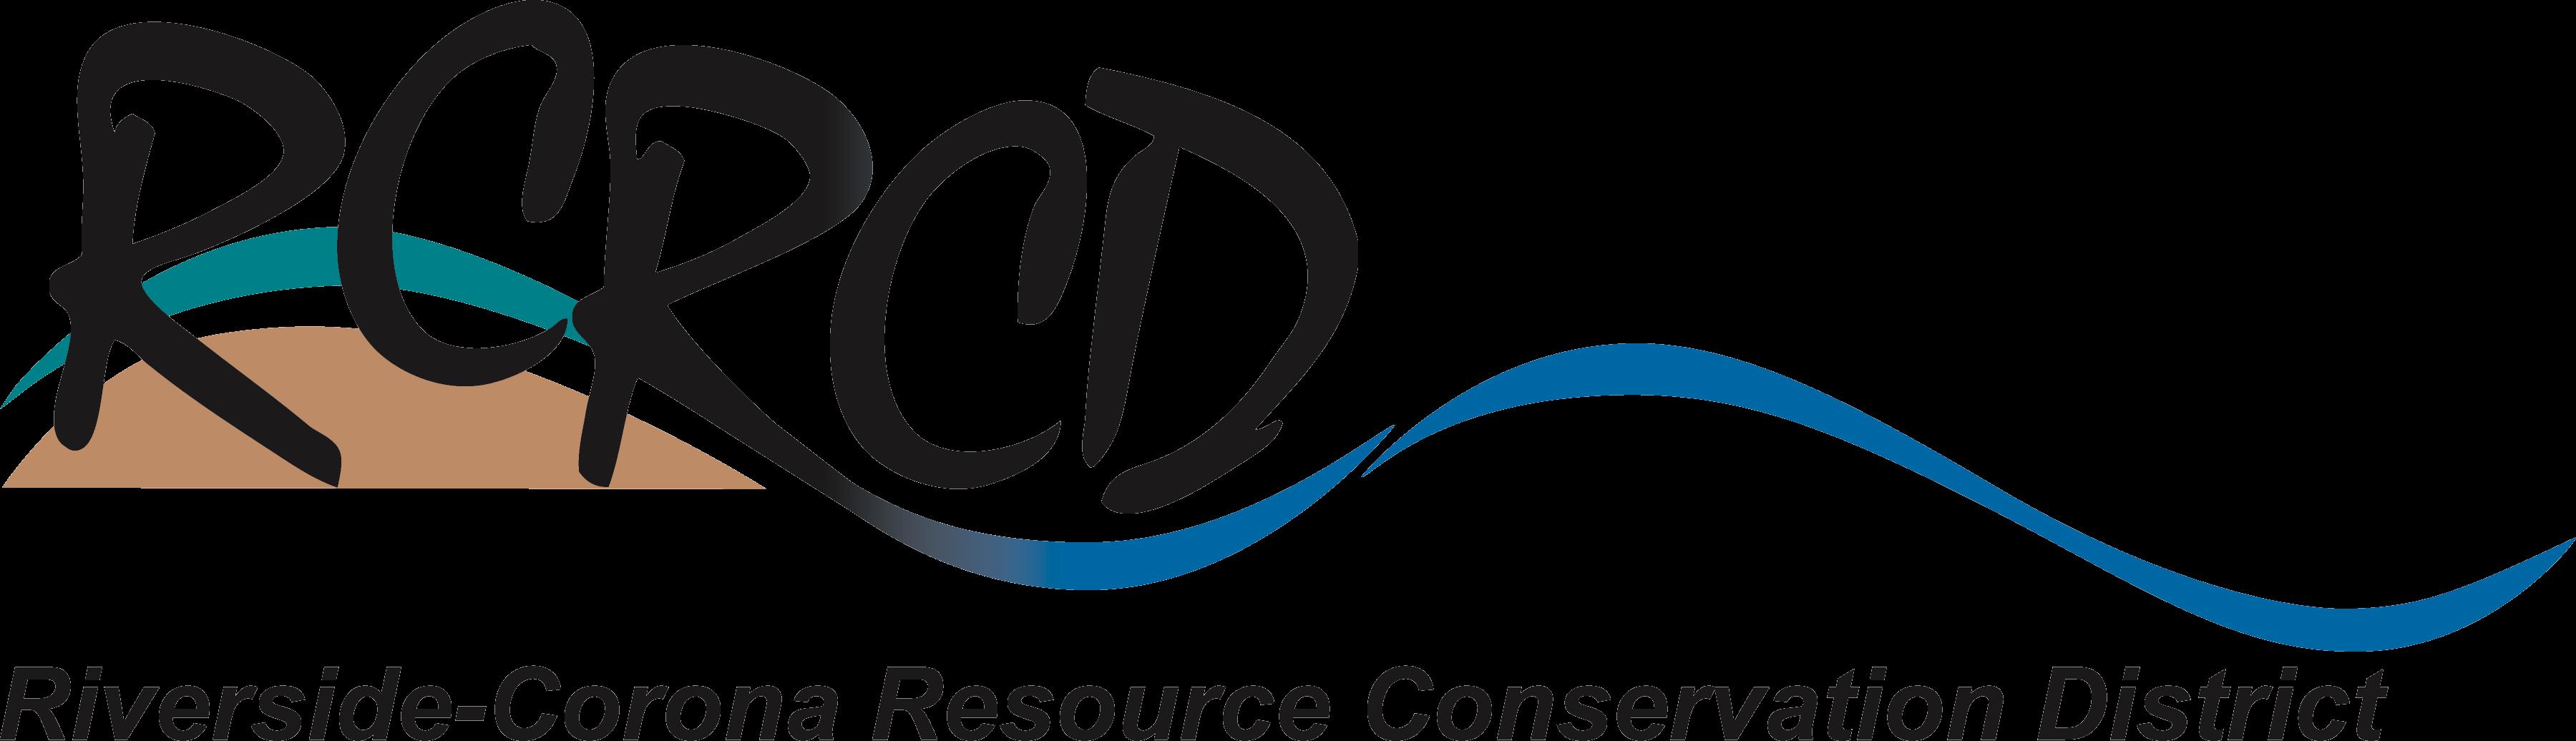 Riverside-Corona Resource Conservation District